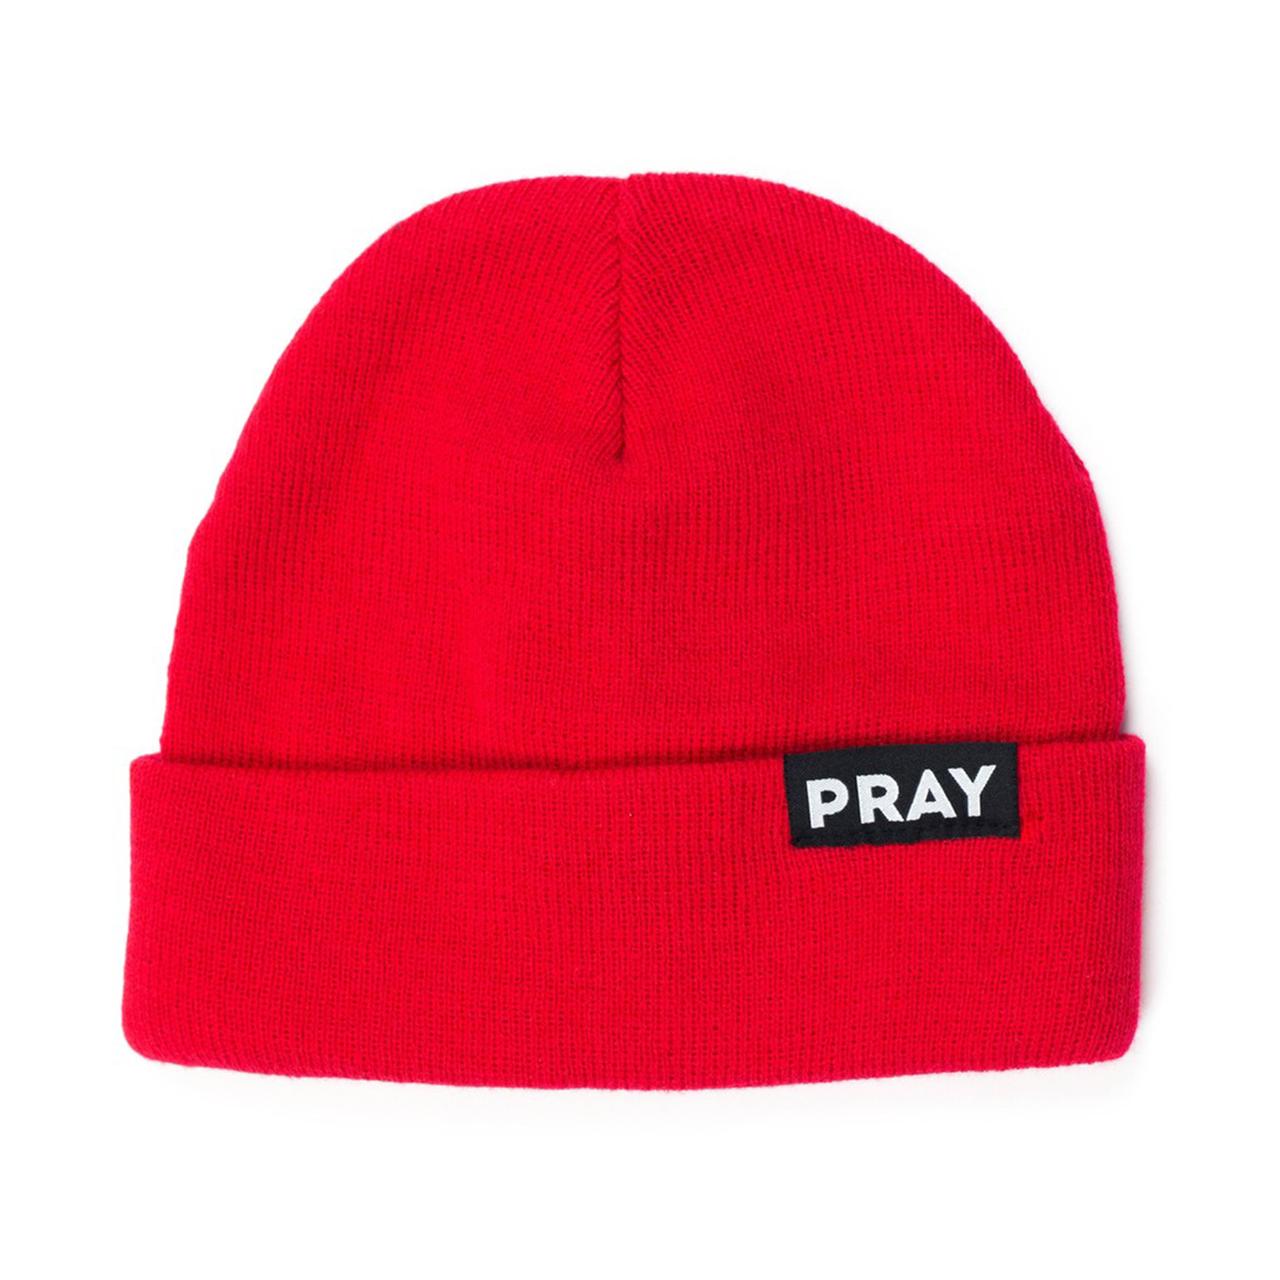 PRAY - Beanie